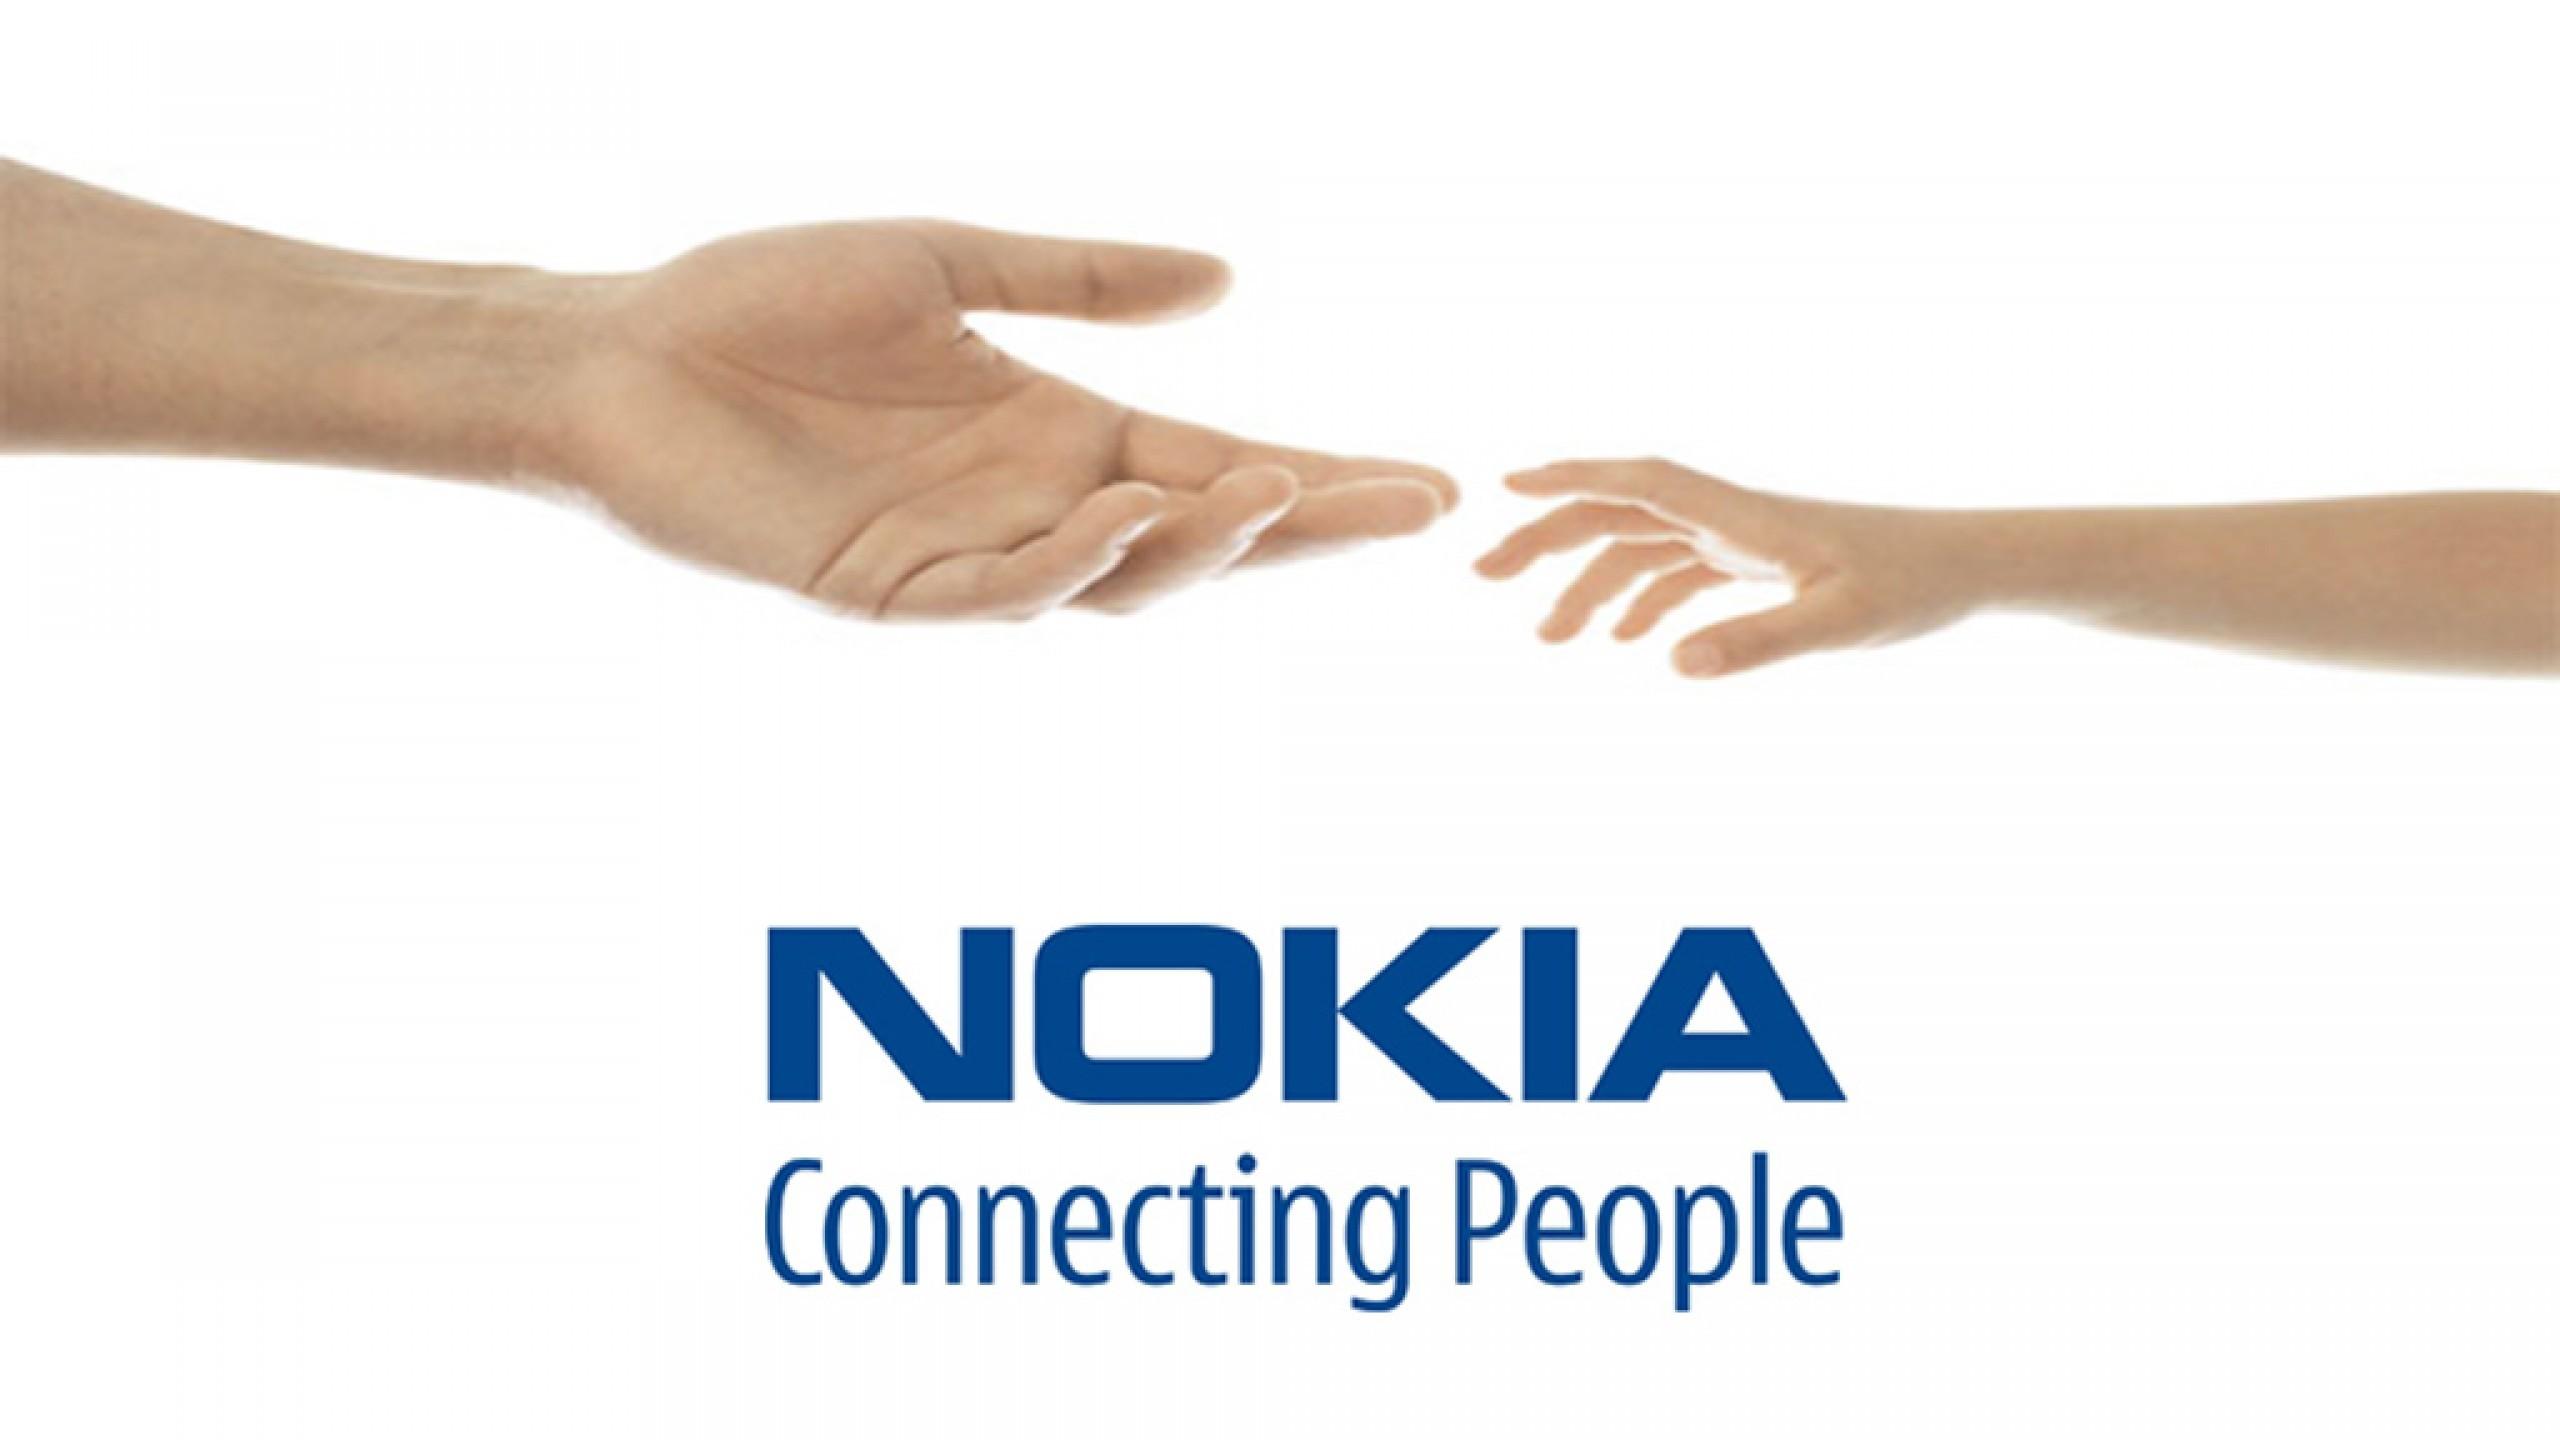 Car Brand Logos Wallpaper Nokia Wallpaper Logos 36 Images